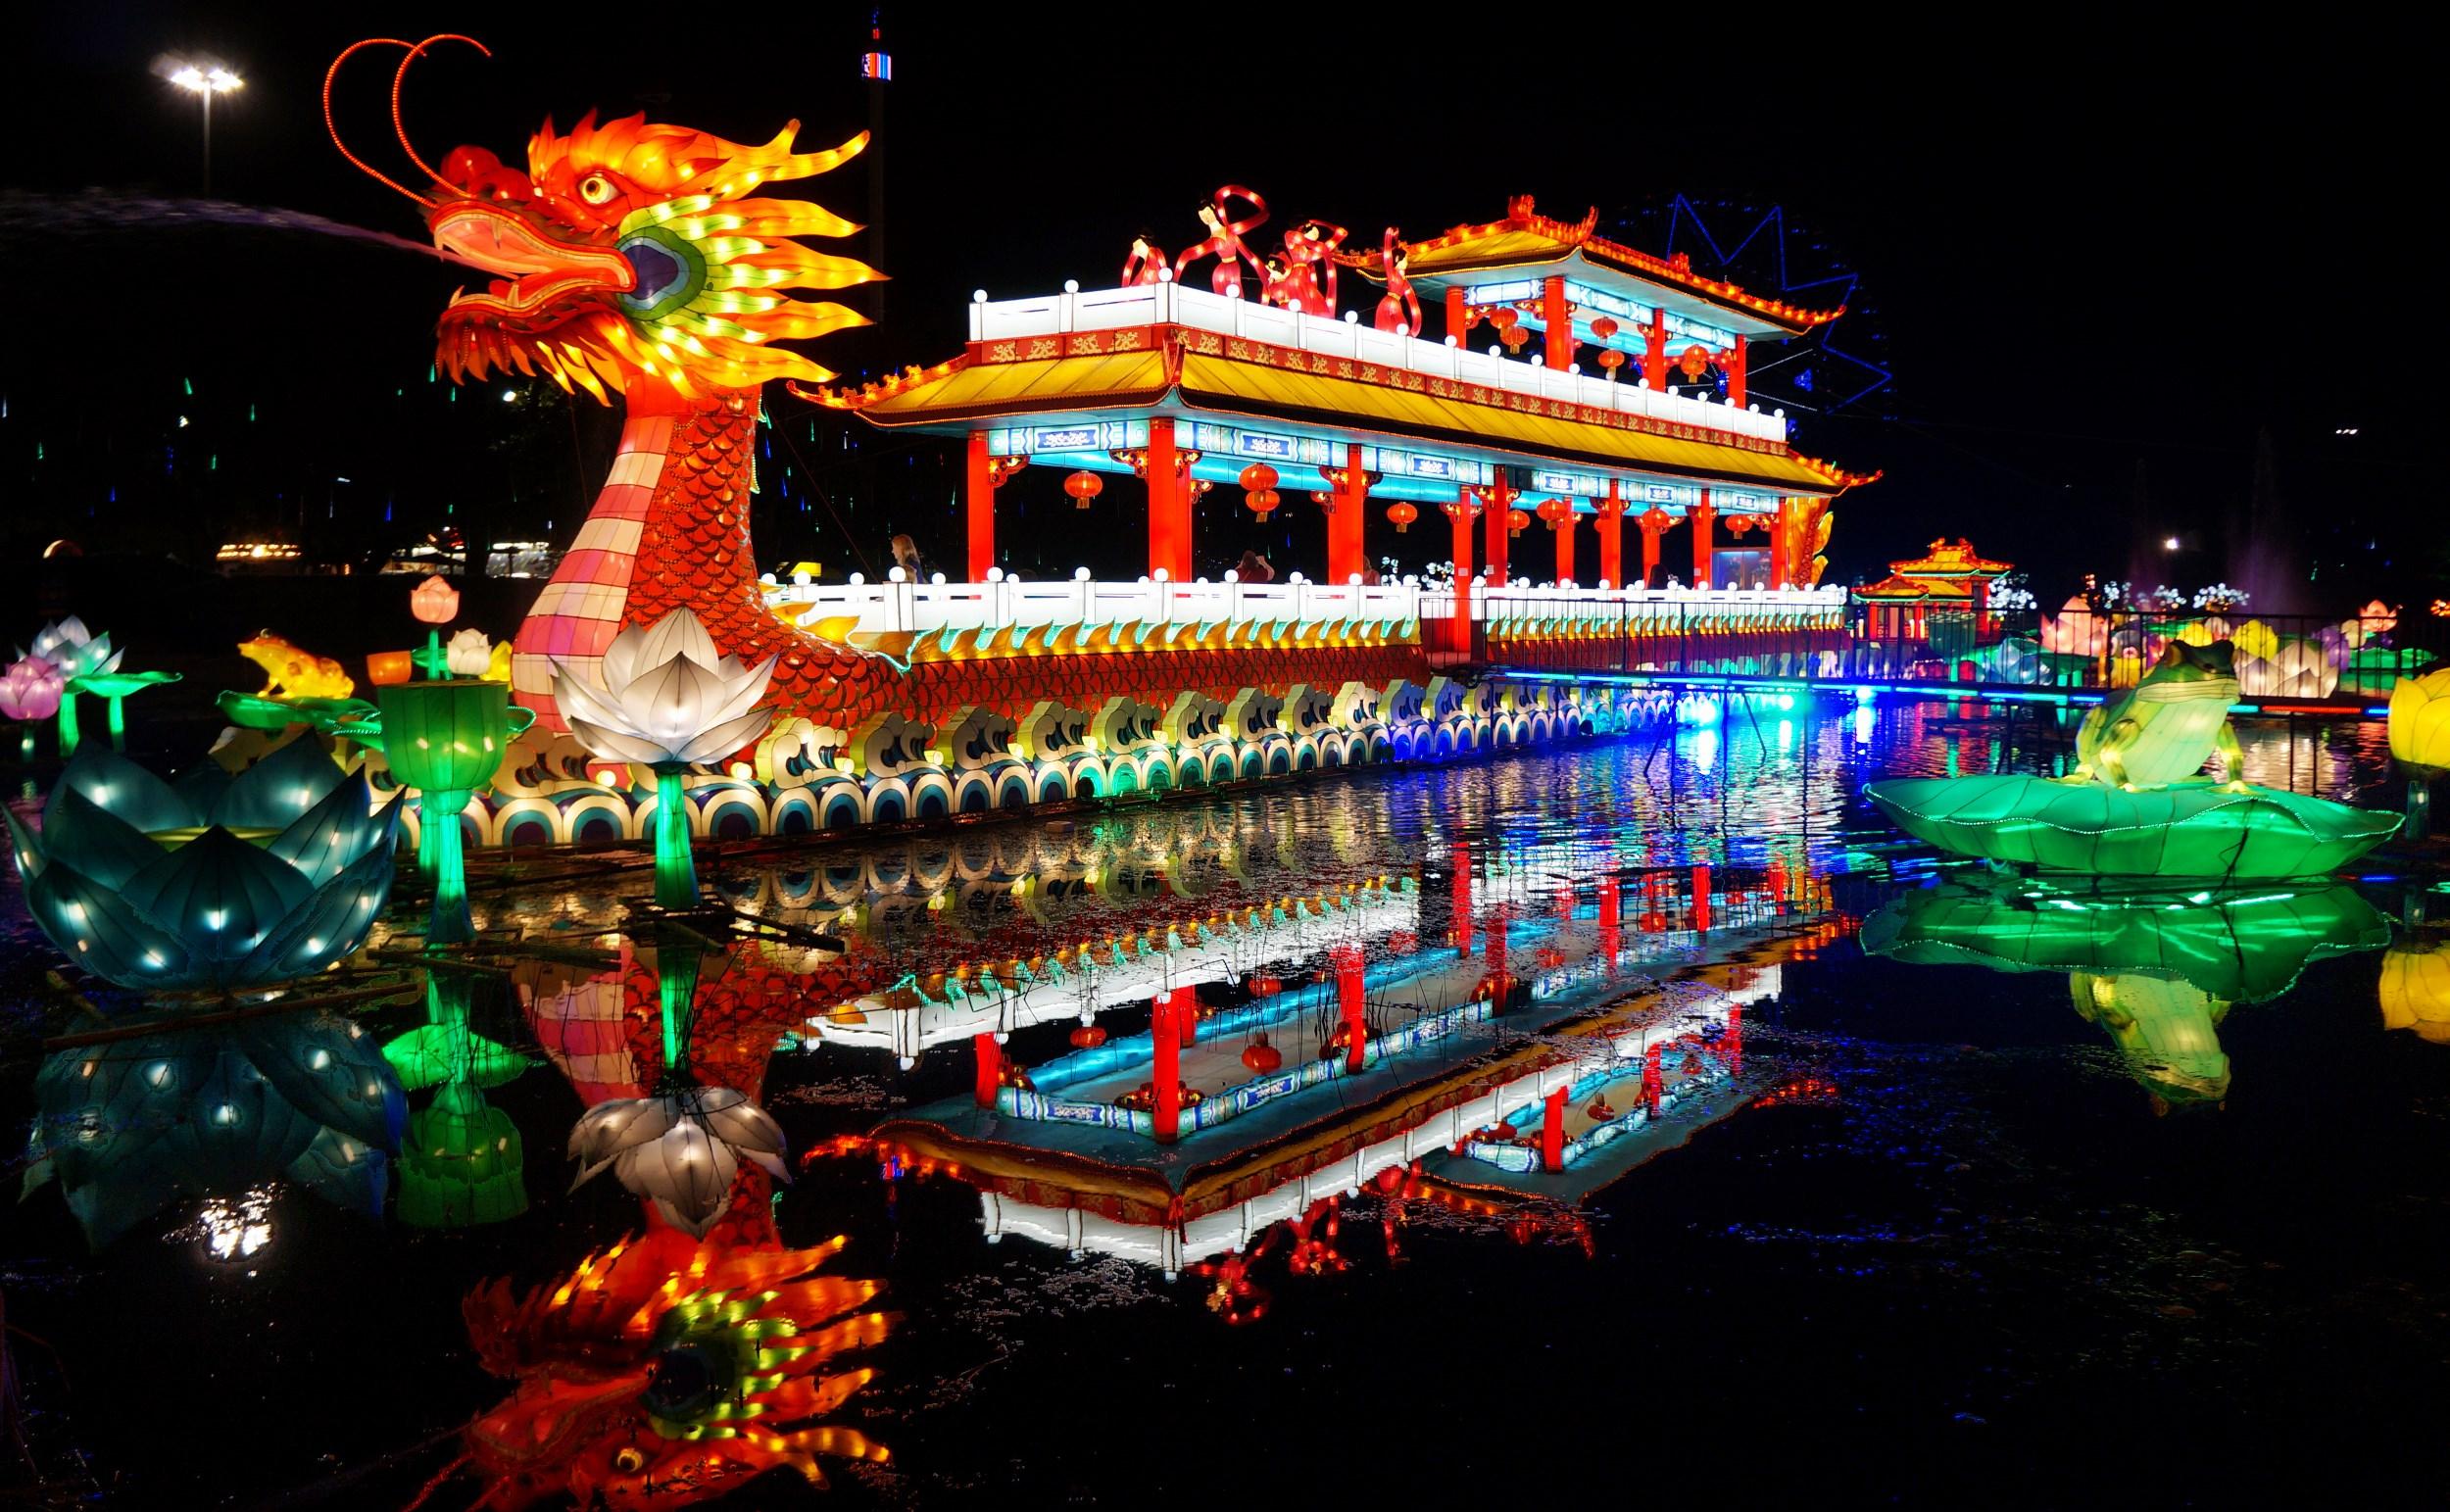 bellingrath garden oriental dragon christmas lights | Tradish - The Lantern Festival: China